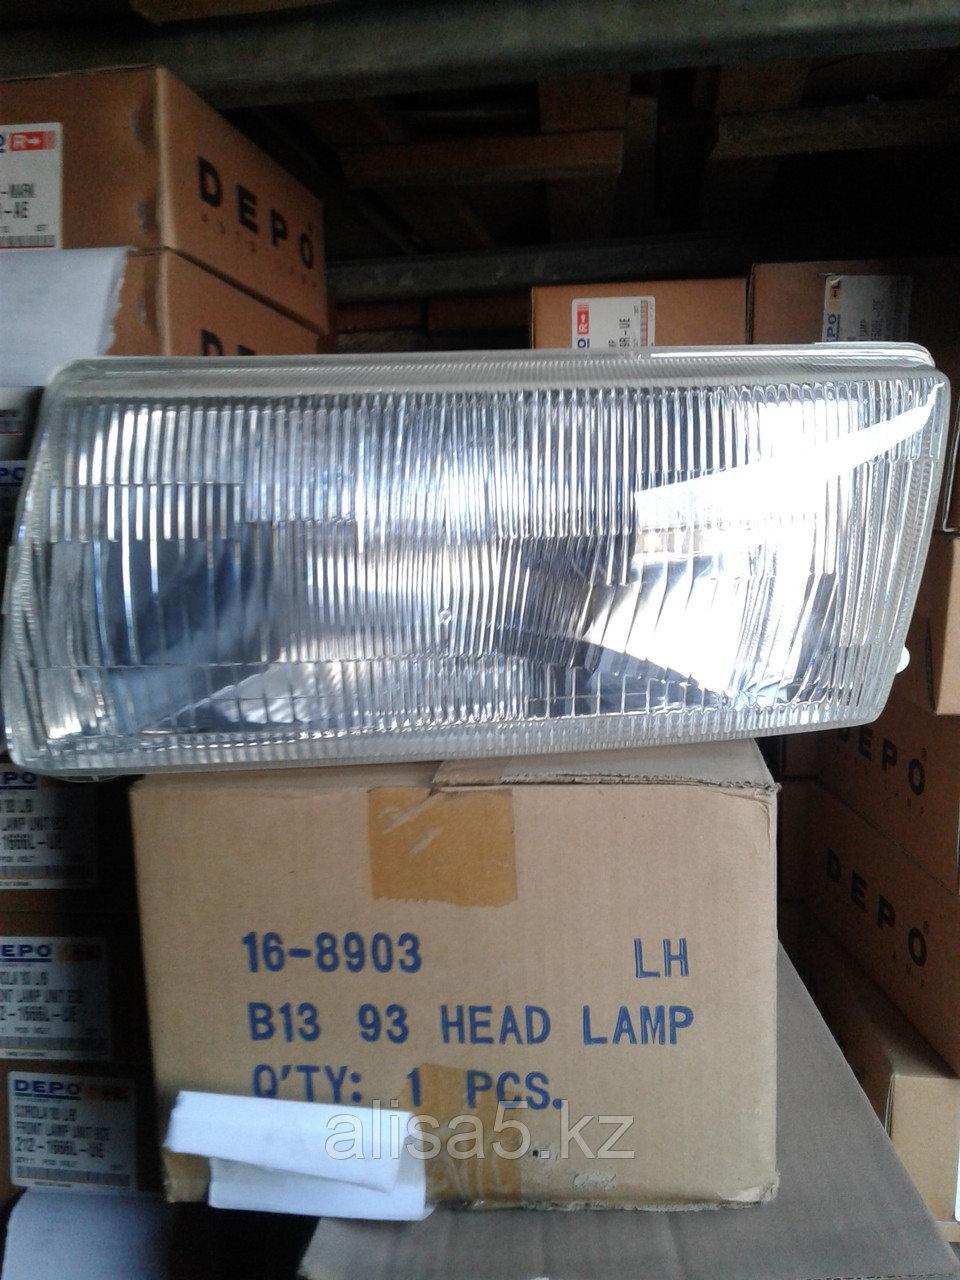 Nissan Sunny B-13 1992-1993 гг. Фара левая (Head lamp lh) 215-1154